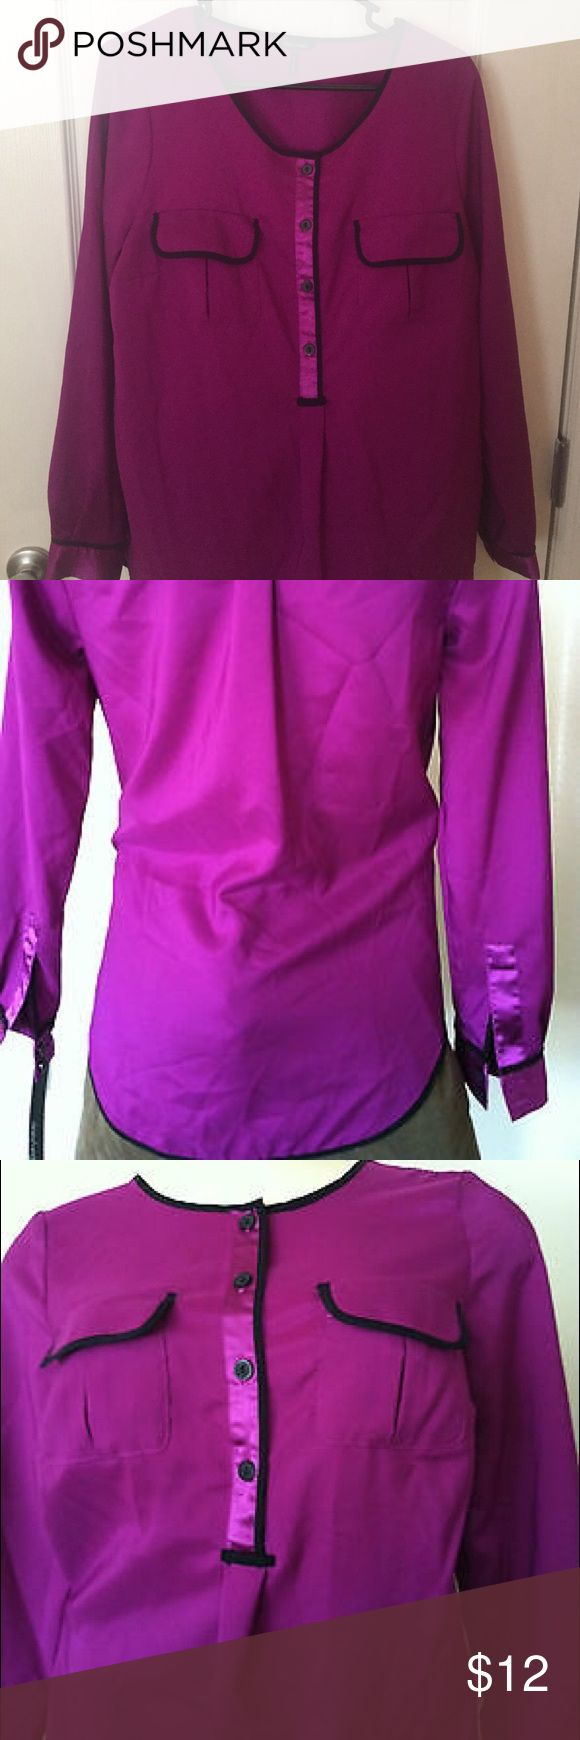 Daisy Fuentes Purple Long Sleeve Blouse Daisy Fuentes Purple Long Sleeve Purple Blouse Daisy Fuentes Tops Blouses